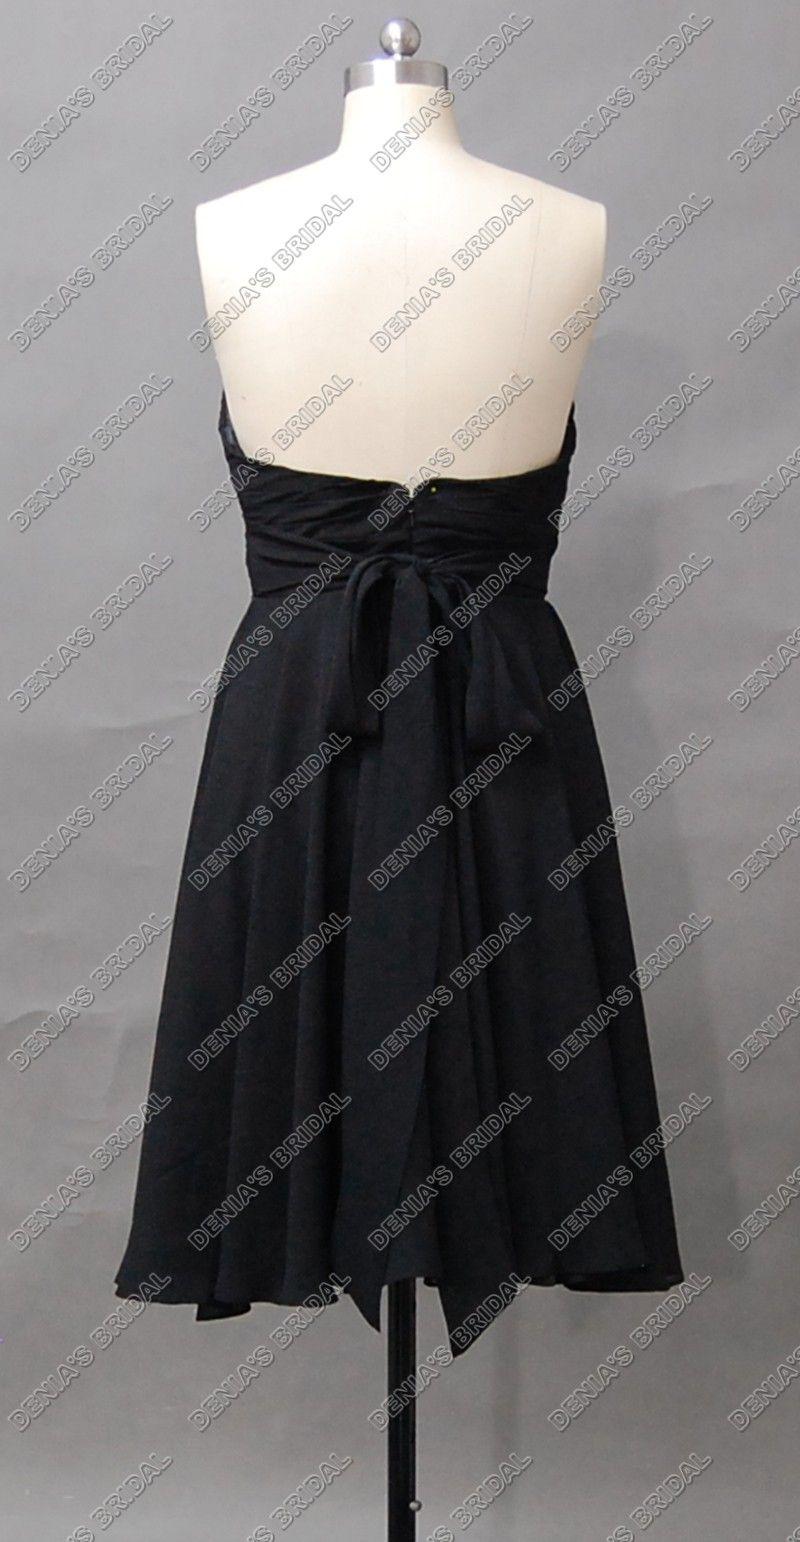 2012 Elegant Black Bridesmaid Dress Strapless Sweetheart Chiffon Sash Tea Längd Faktiska Real Images